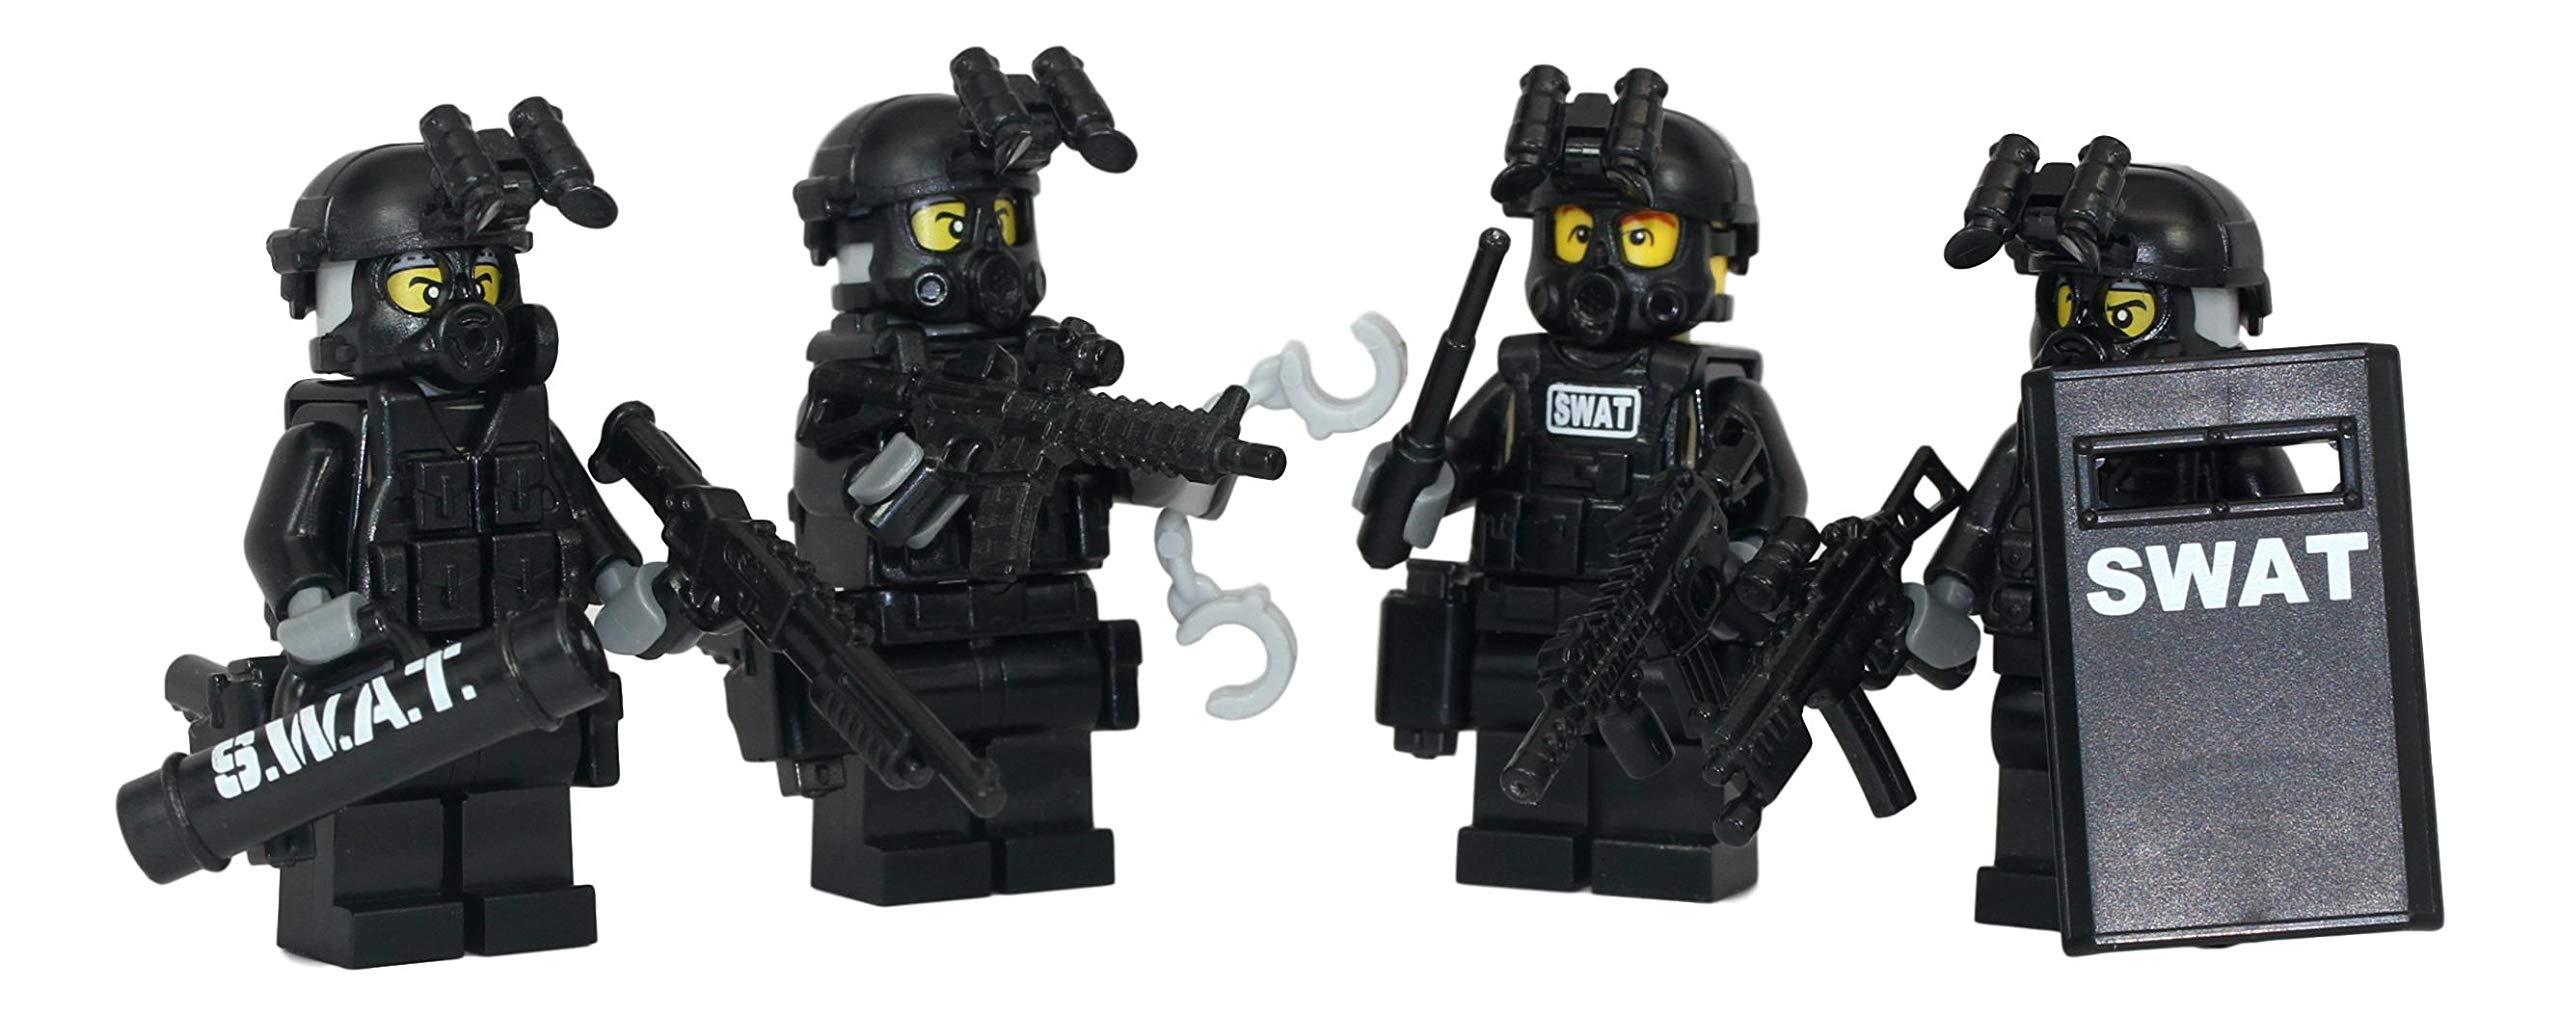 Swat Team Police Squad - Modern Brick Warfare Custom Minifigure